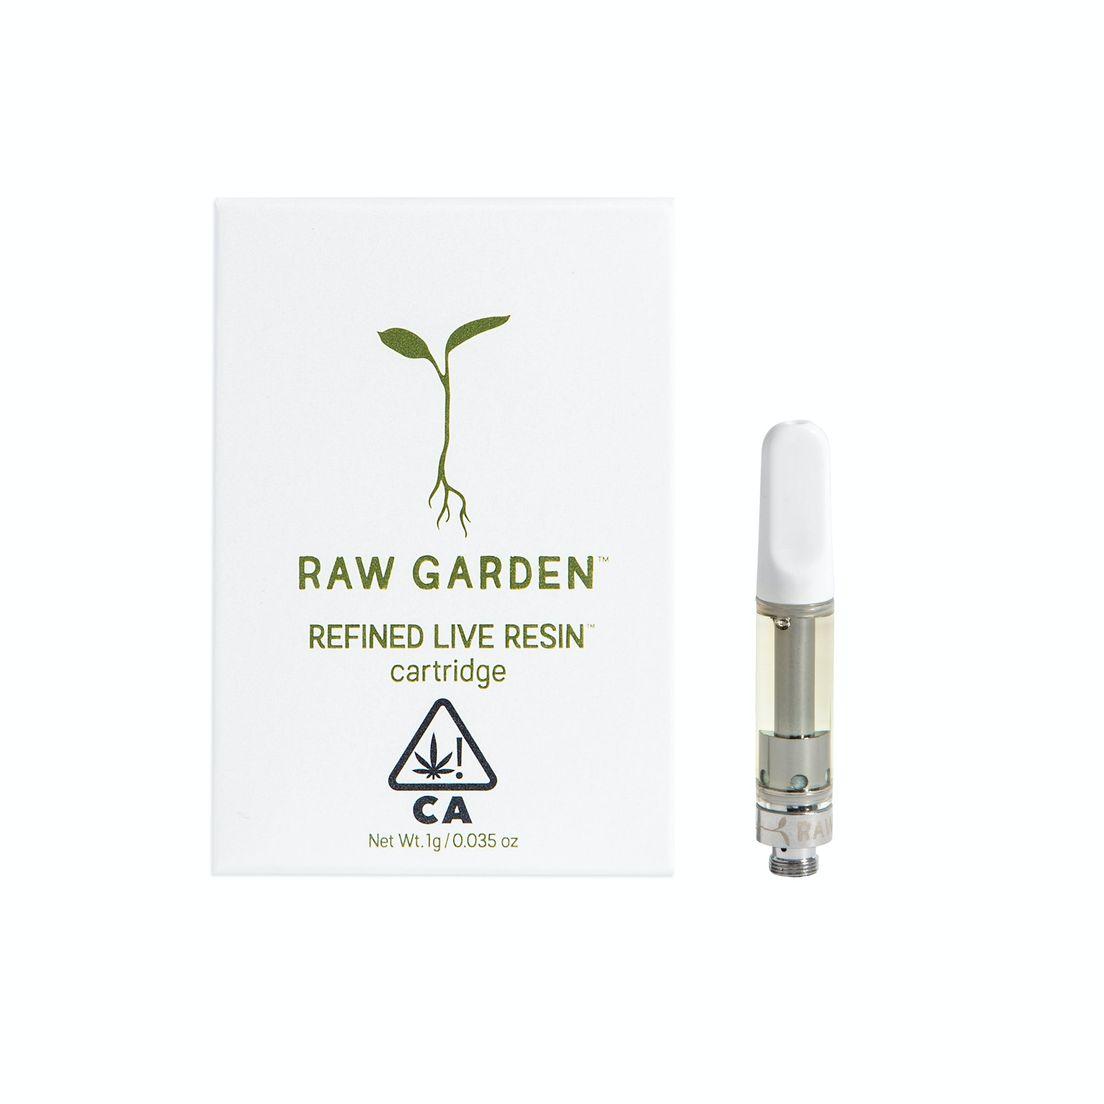 Raw Garden Sky Melon Live Resin Cartridge 1.0g